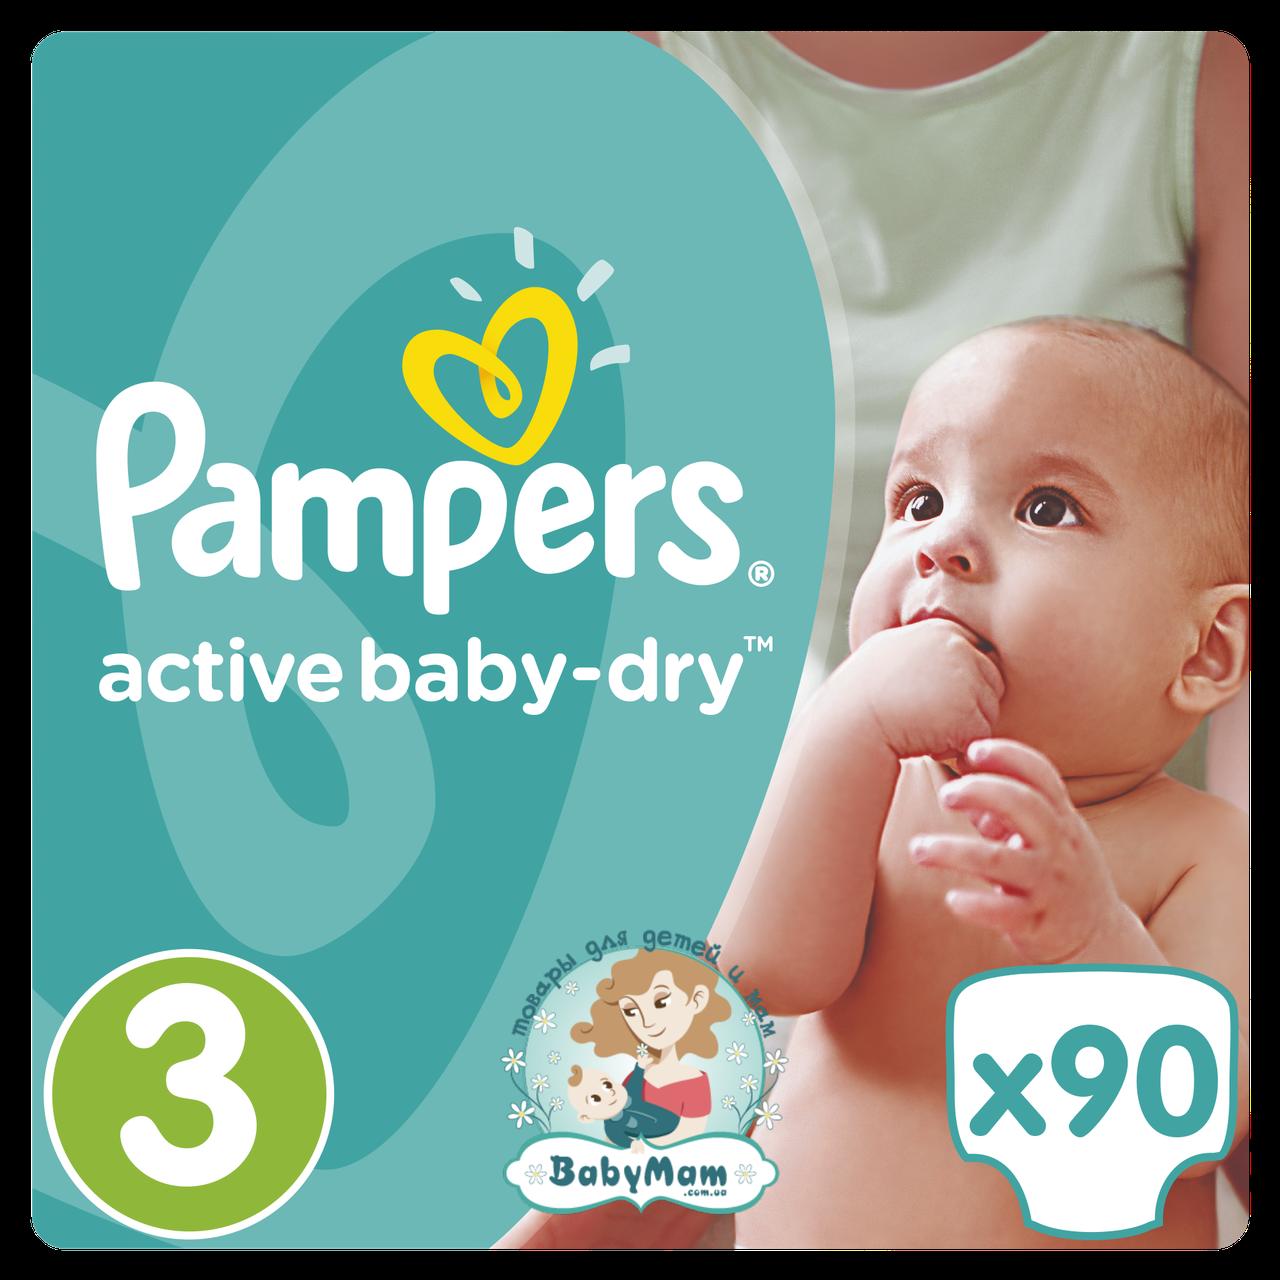 Подгузники Pampers Active Baby-Dry Размер 3 (Midi) 5-9 кг, 90 подгузников